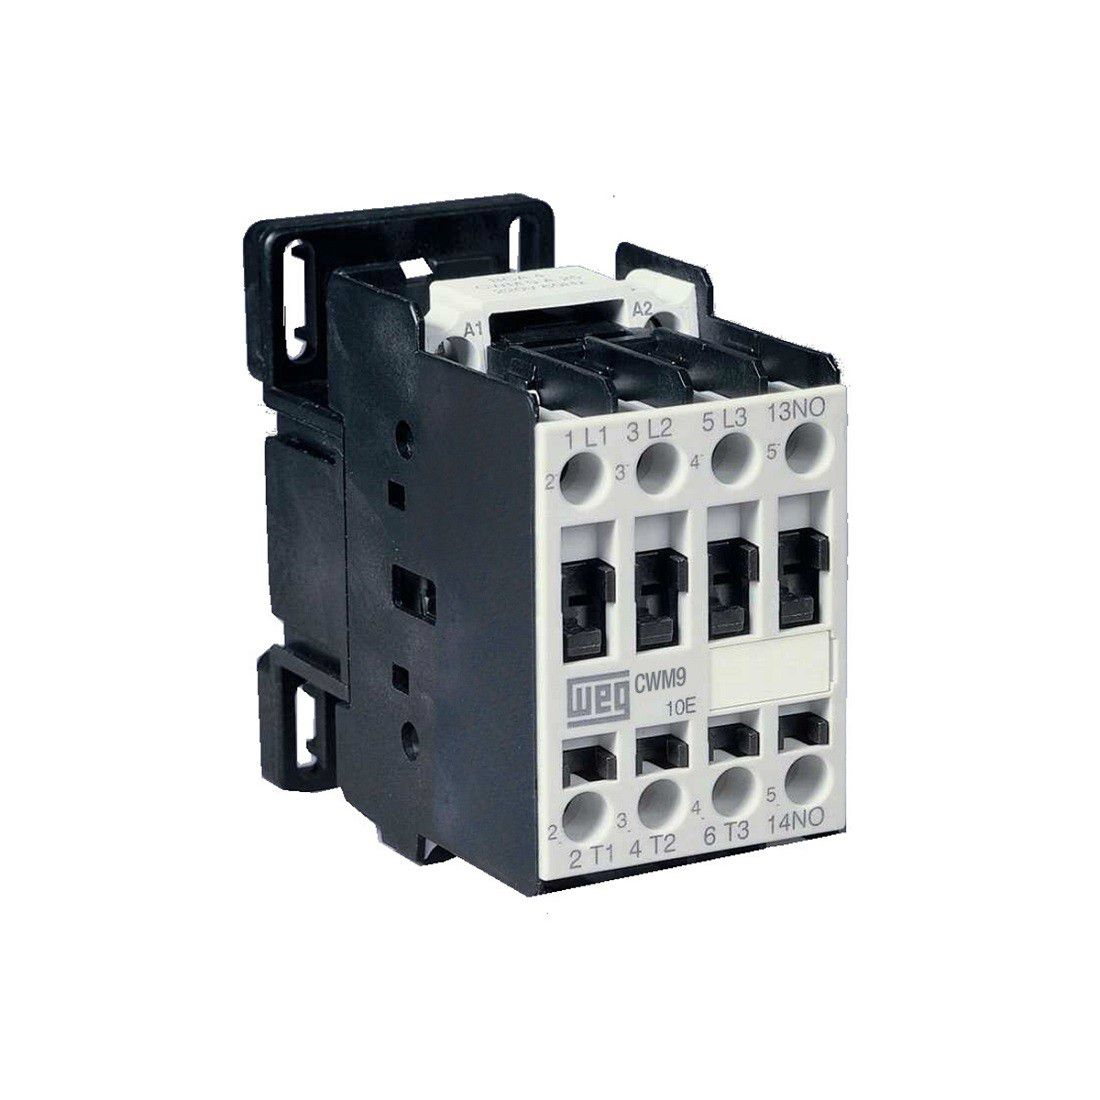 Contator 9A CWM9-10-30V26 220V WEG